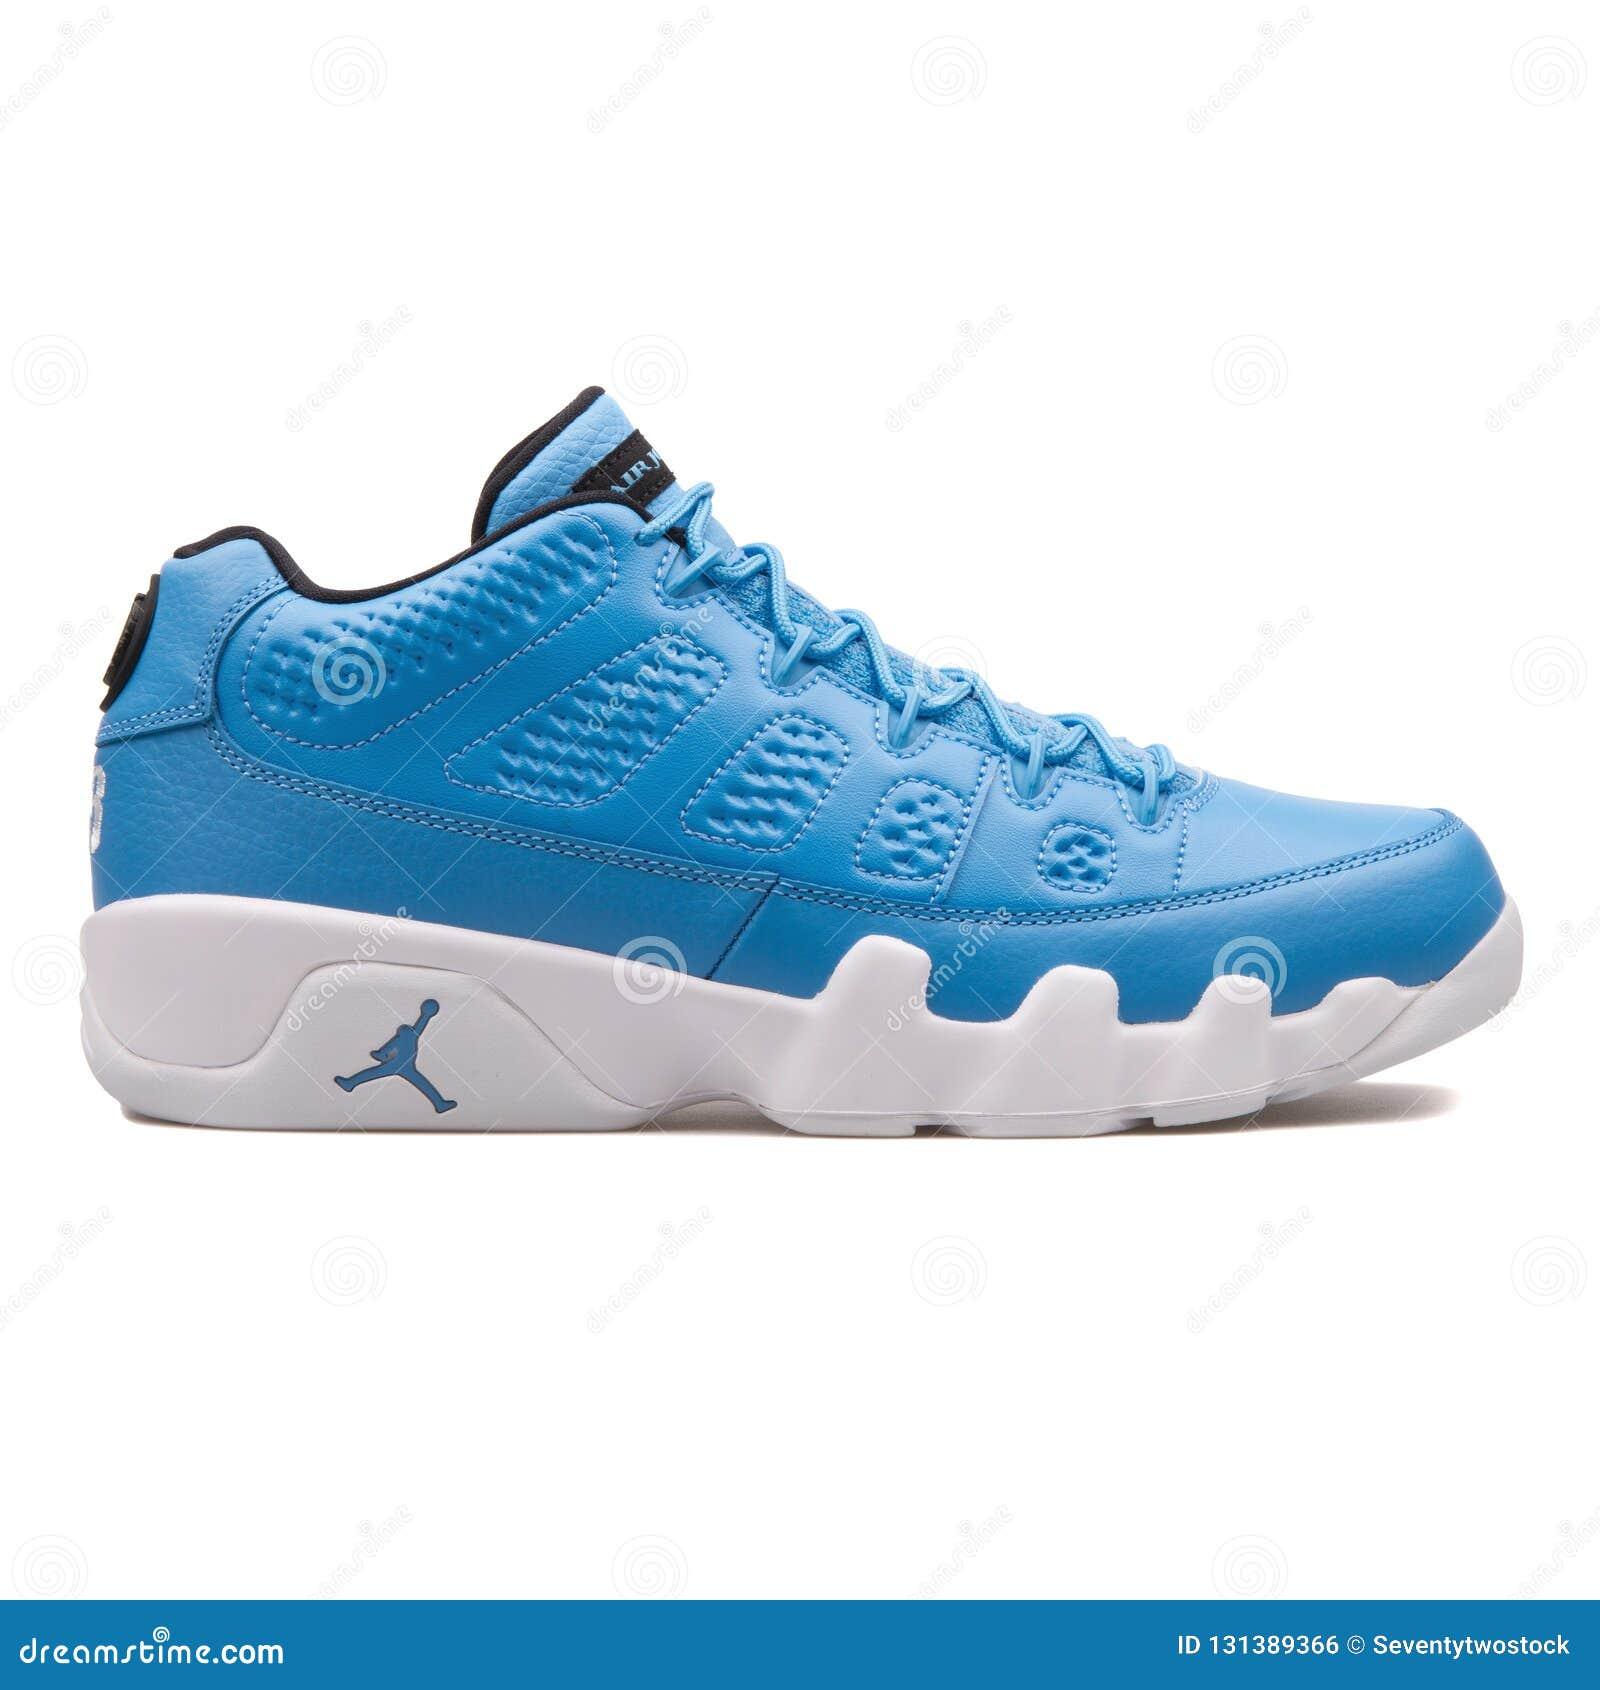 online retailer cf93f be98c Nike Air Jordan 9 Retro Low university blue sneaker isolated on white  background